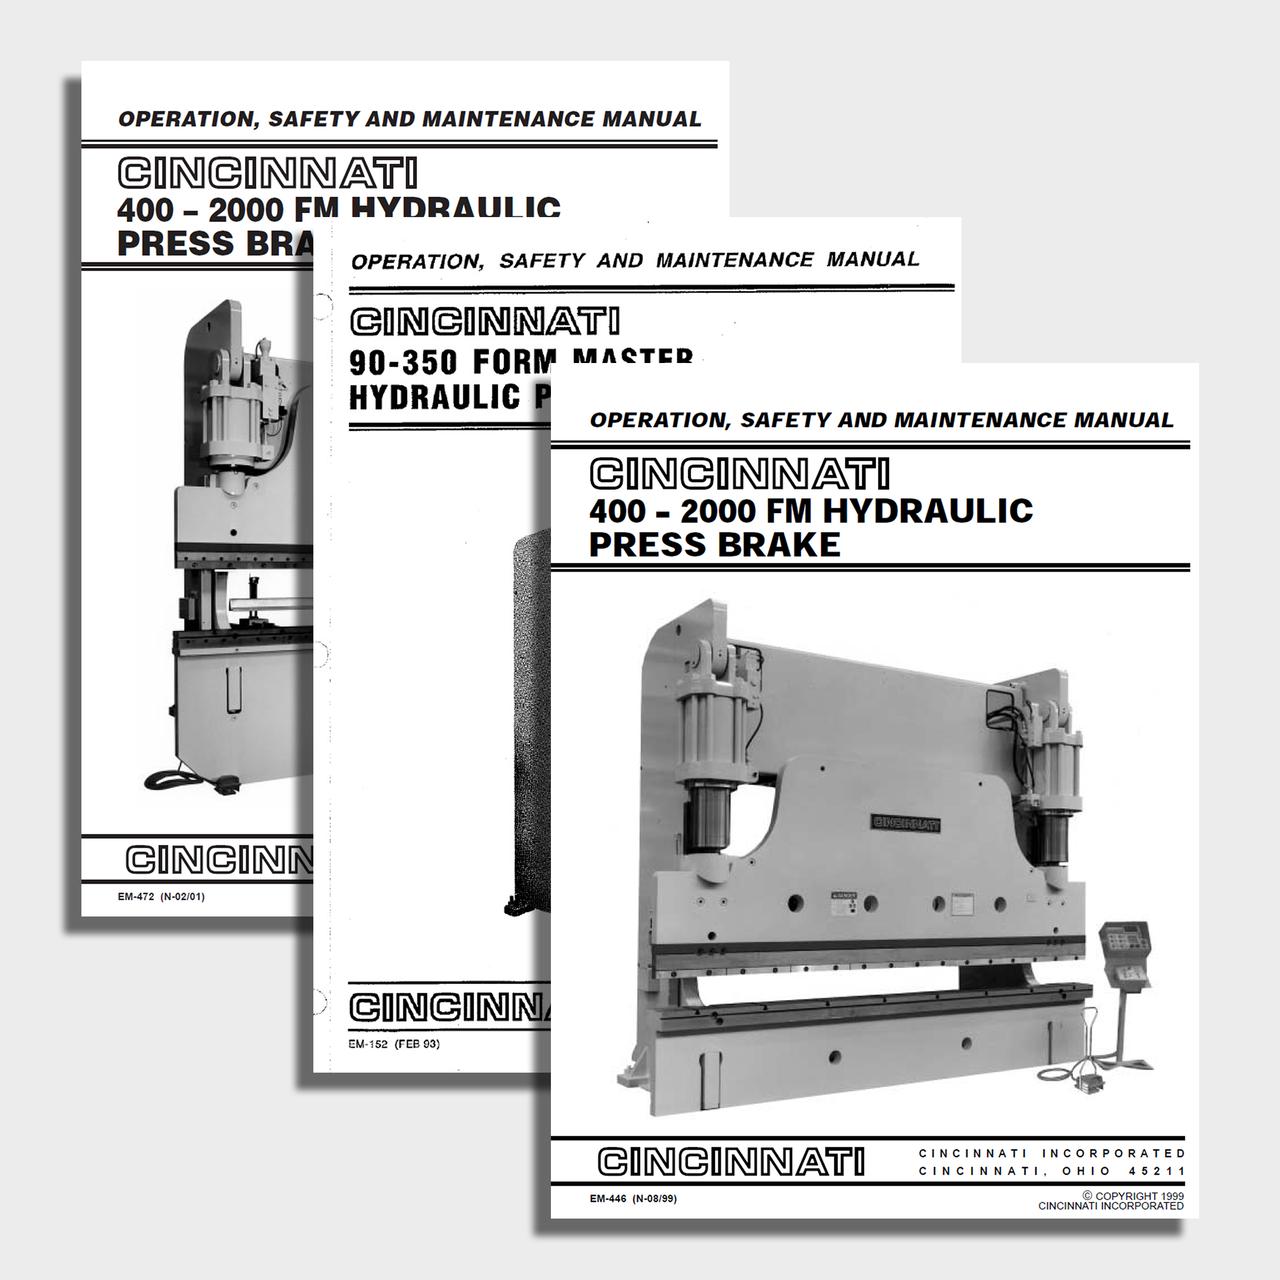 Tekin rs manual tekin rs gen2 sensored brushless esc array icme manual mini 2003 car owners manual u2022 rh karenhanover co fandeluxe Gallery